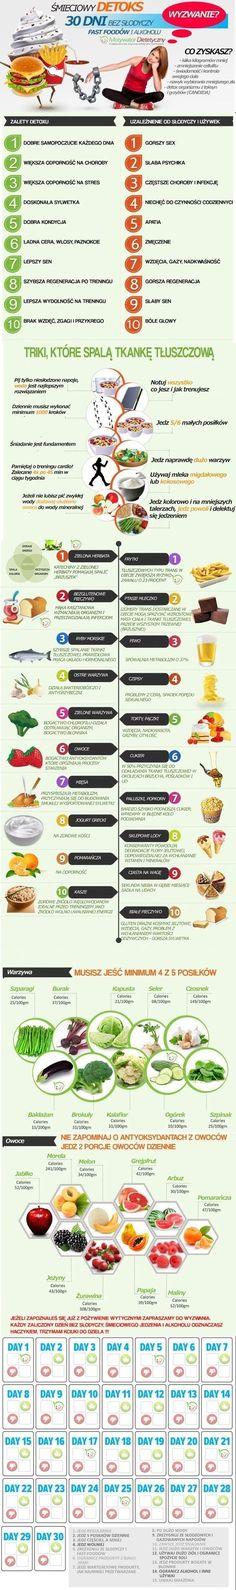 30 Days Detox plan - No sweets, junk food or alcohol. By MotywatorDietetyczny Detox Plan, Junk Food, 30 Day Detox, Healthy Tips, Healthy Recipes, Alcohol Detox, Detox Tips, Detox Drinks, Food Hacks